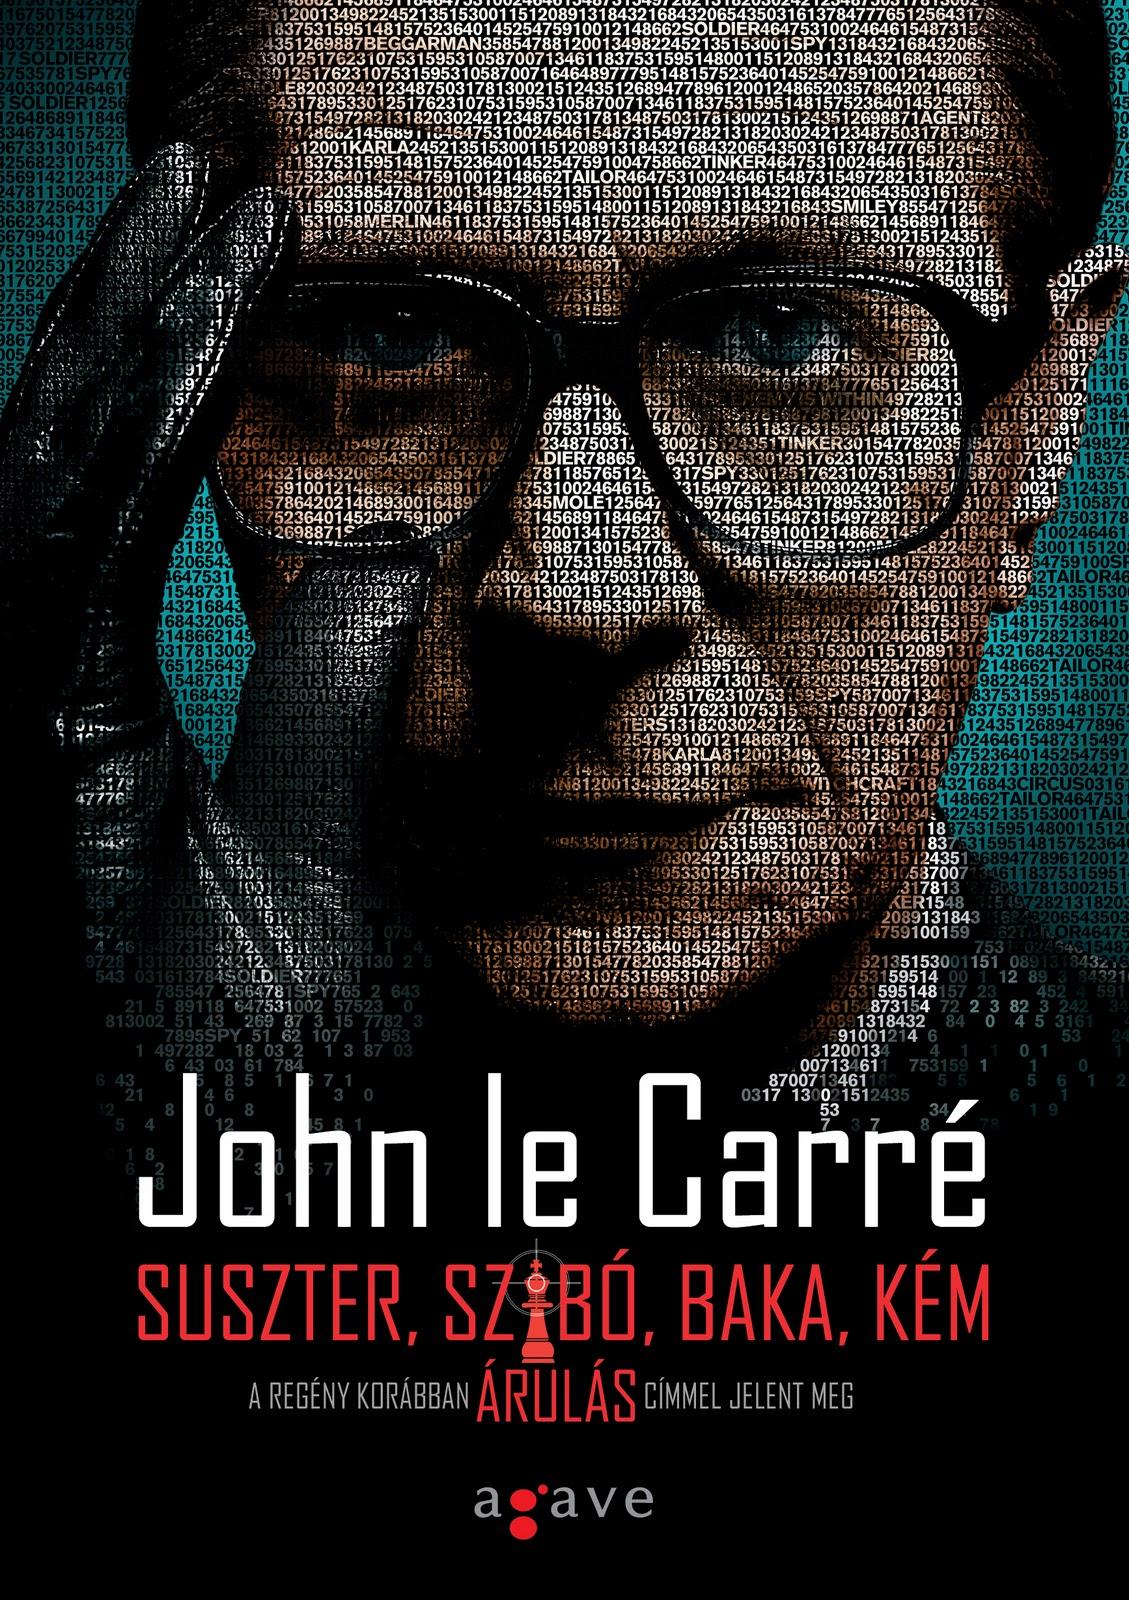 http://2.bp.blogspot.com/-qGcpaQBXCkM/TyRlCNKDTnI/AAAAAAAAAMg/4kZRLJX8IKk/s1600/John_le_Carre_Suszter_szabo_baka_kem_b1_300dpi.jpg